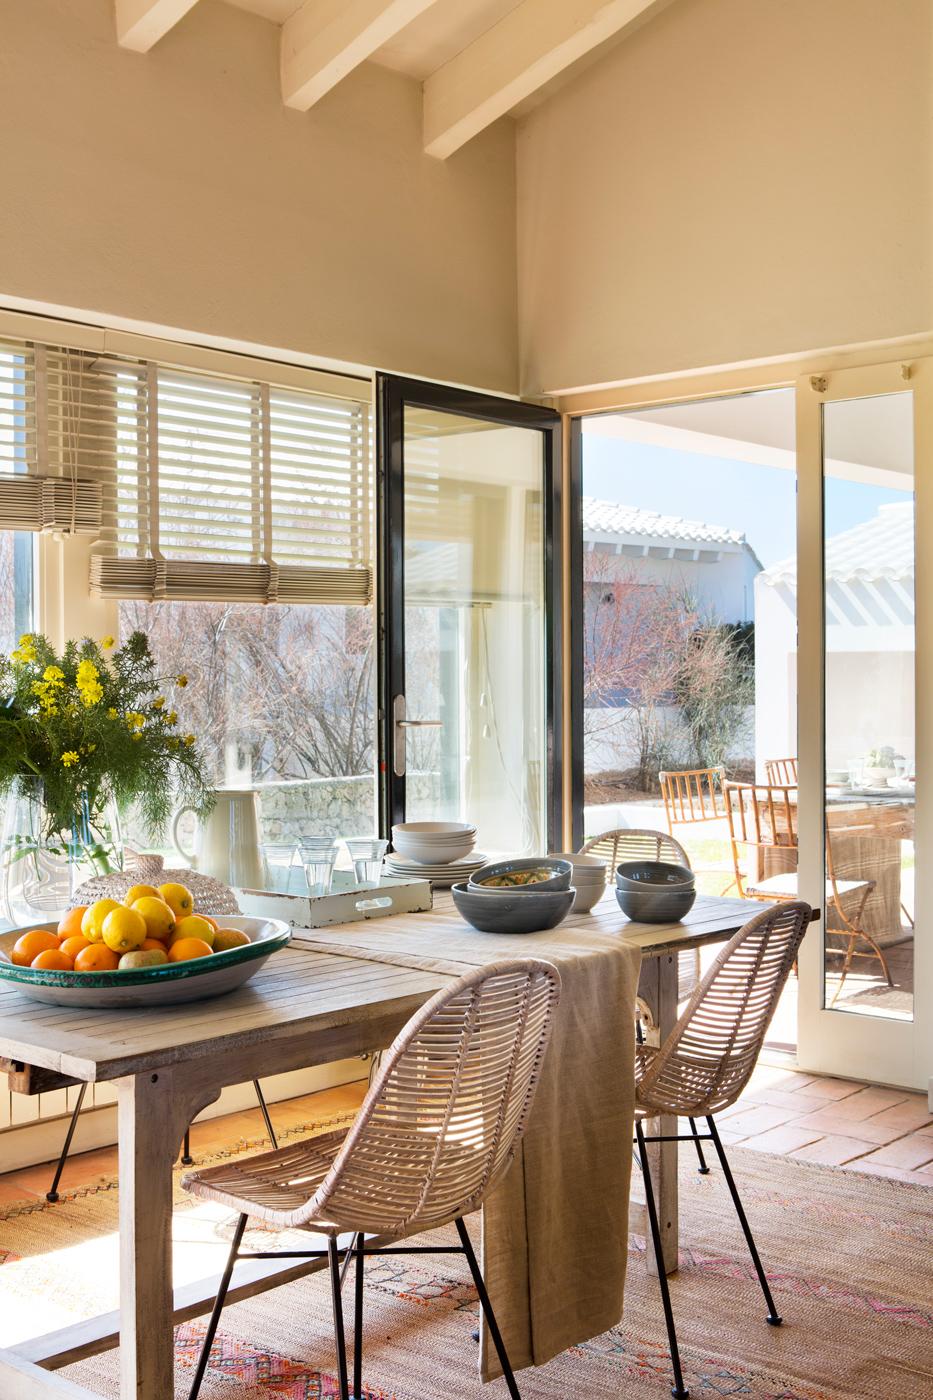 Estores comedor instalacin de cortina lisa blanca for Mesa de terraza con quitasol